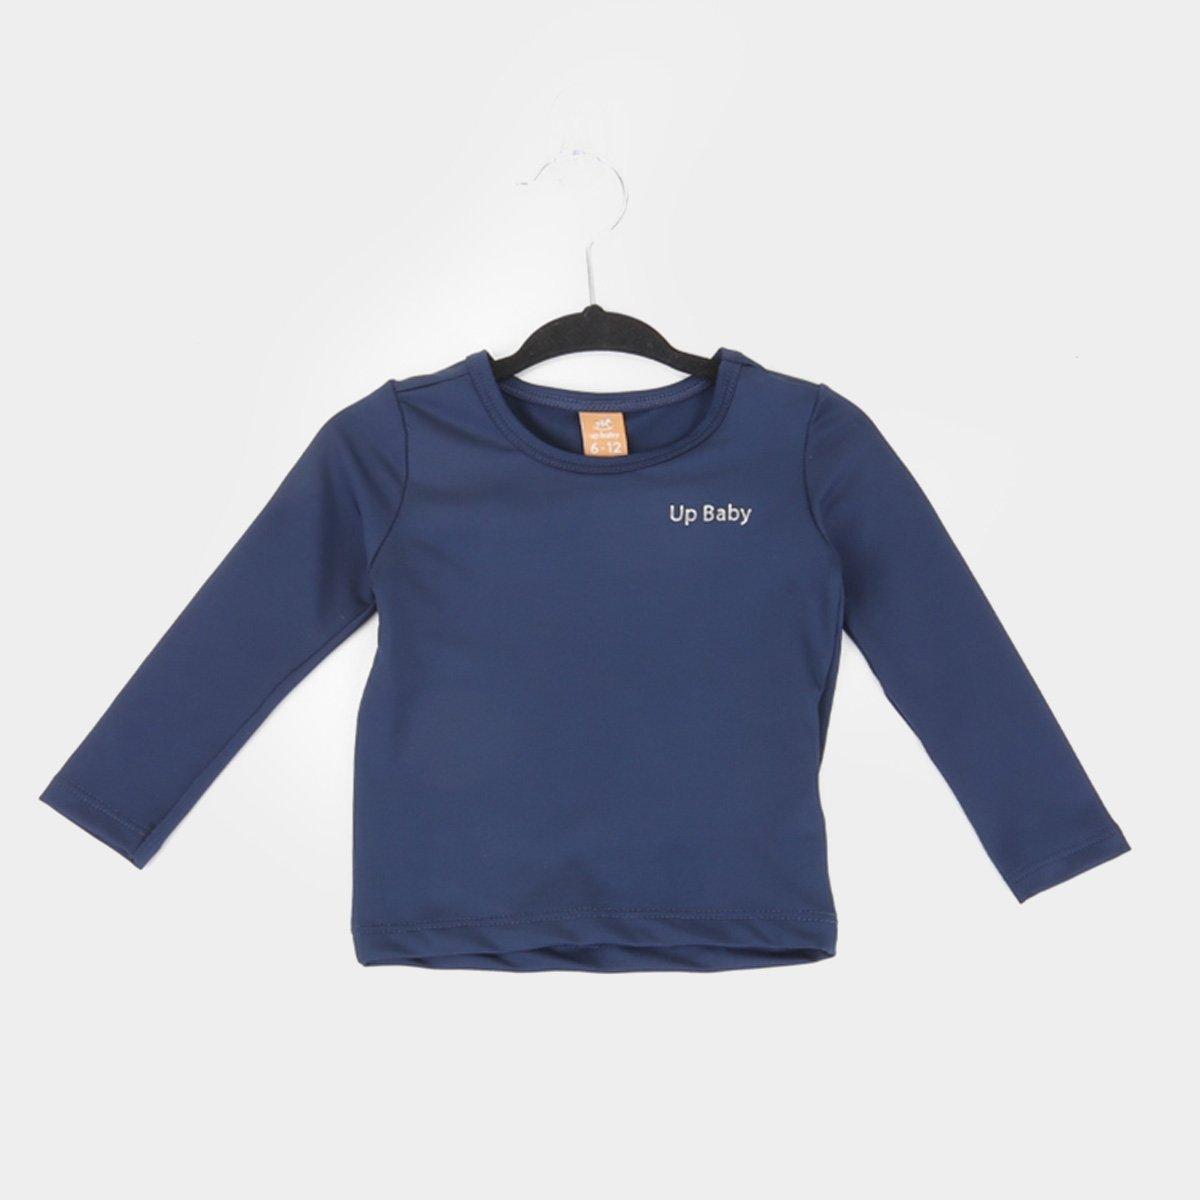 Camiseta Infantil Up Baby Proteção UV Manga Longa Feminina